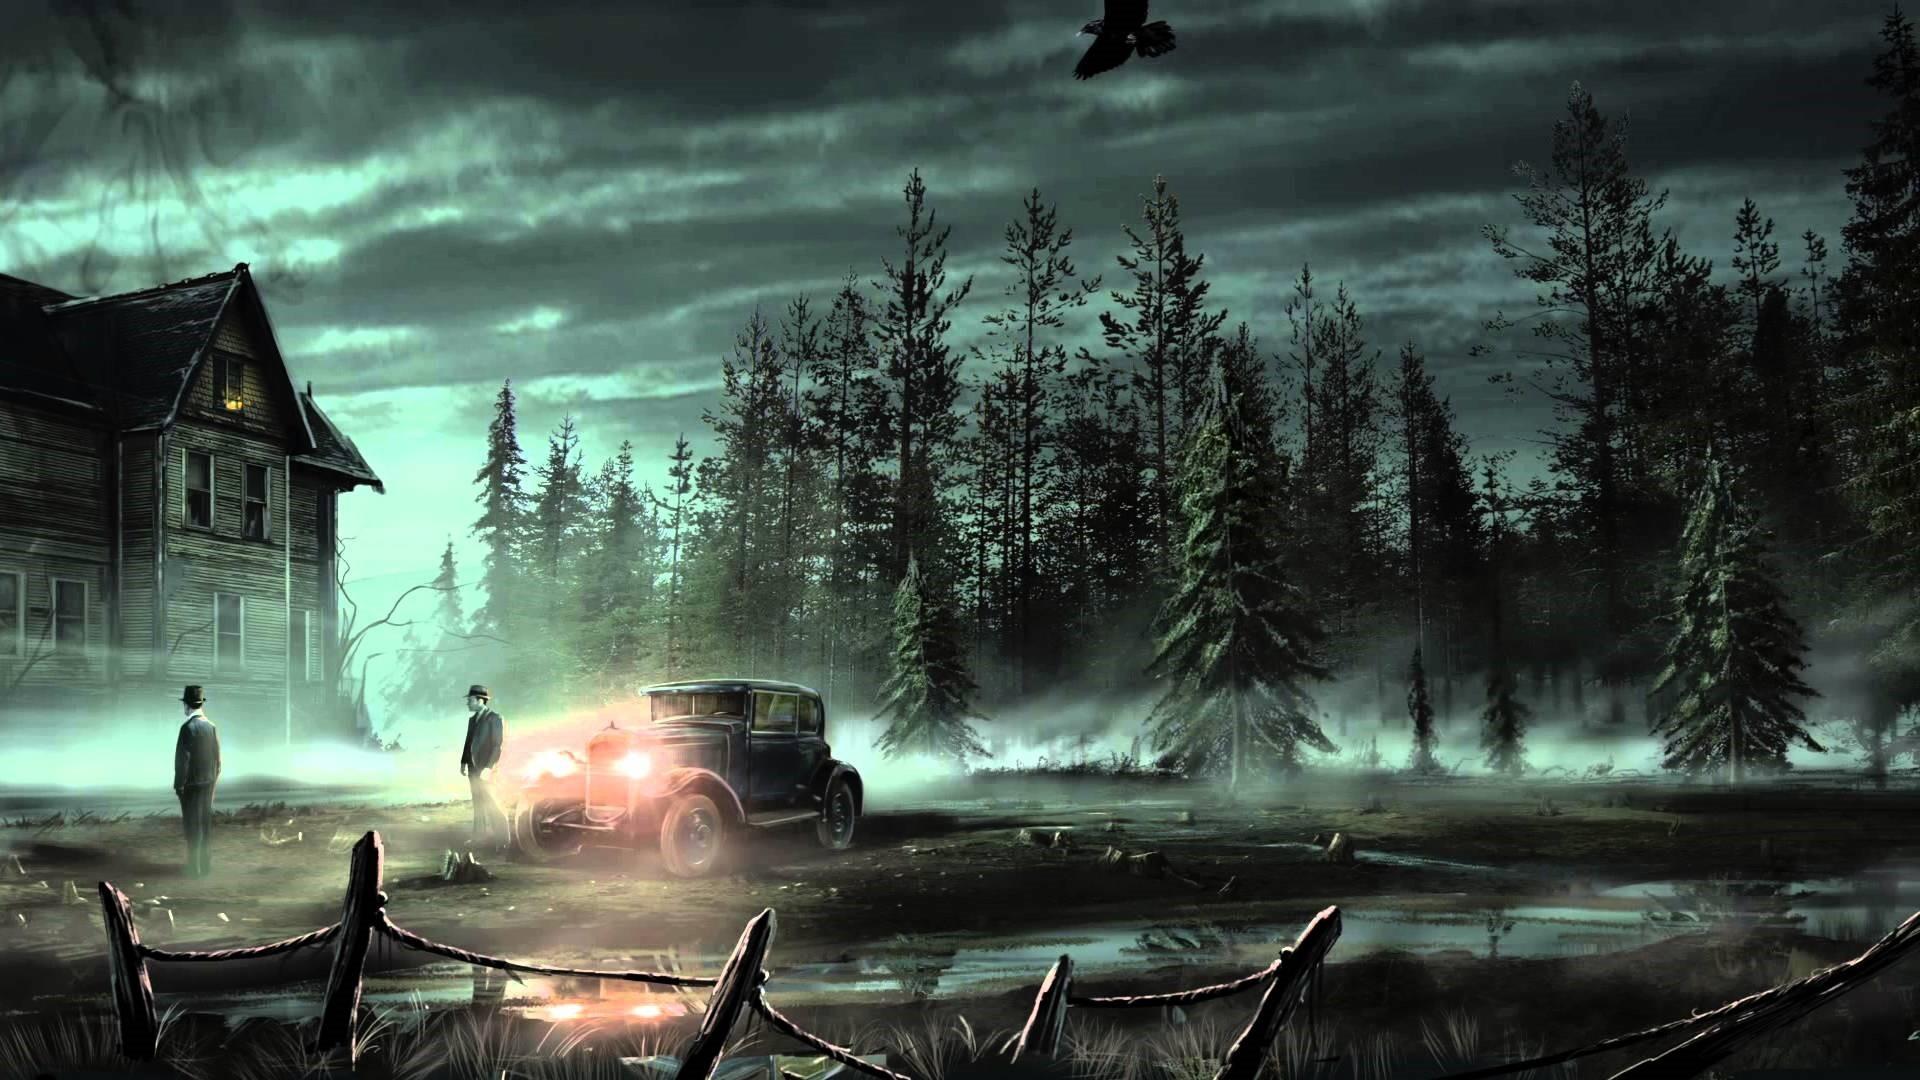 Lovecraft Wallpaper Image